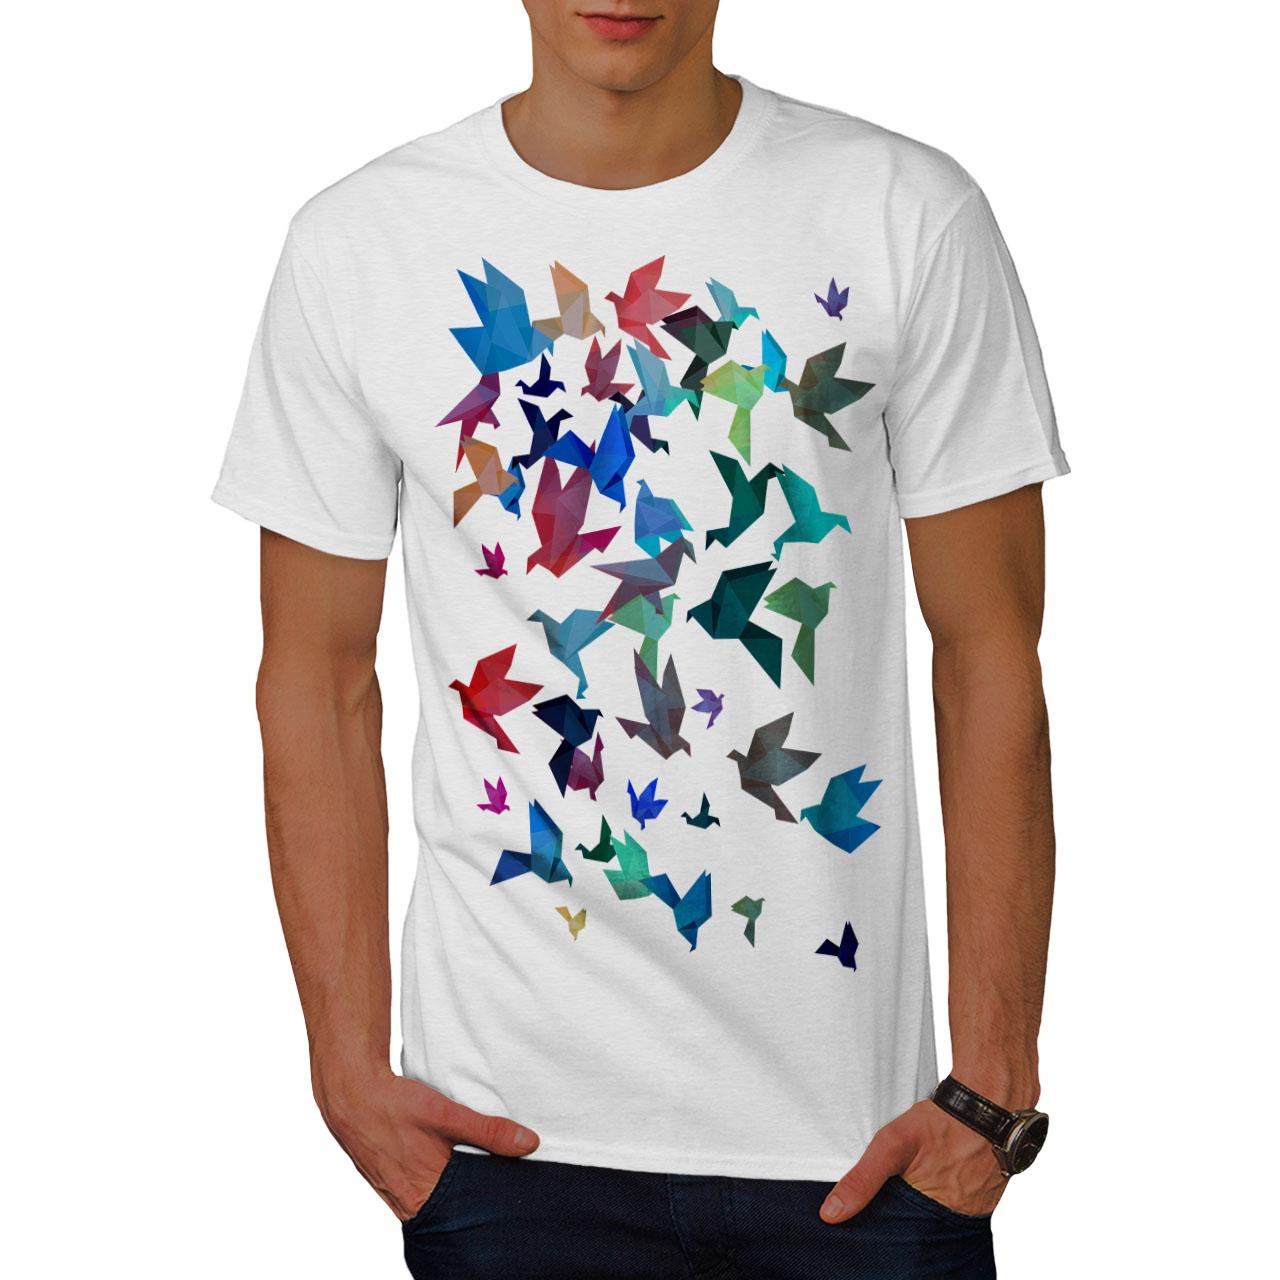 Wellcoda-Origami-Bird-Colors-Mens-T-shirt-Craft-Graphic-Design-Printed-Tee thumbnail 9